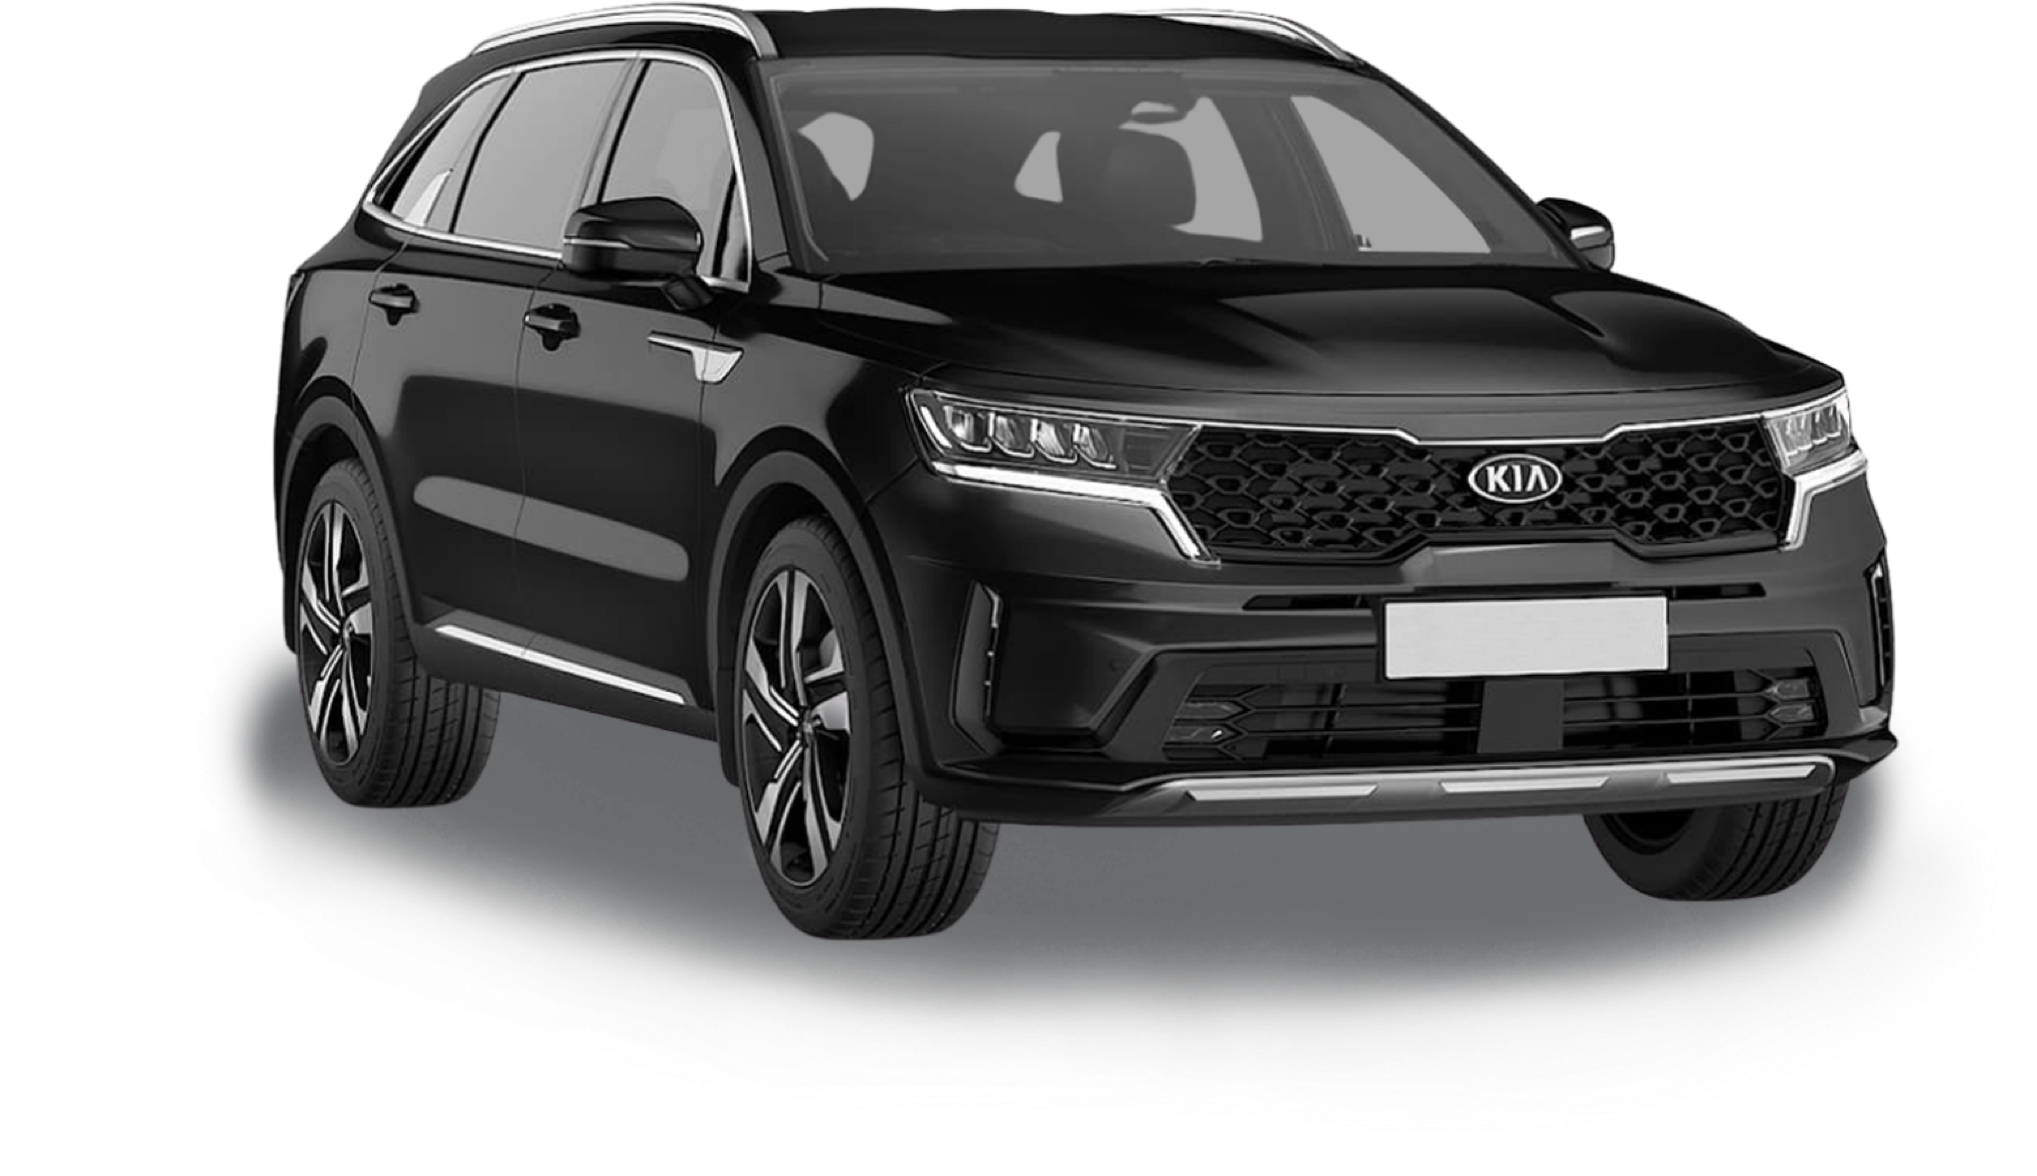 Online new car loan comparison platform